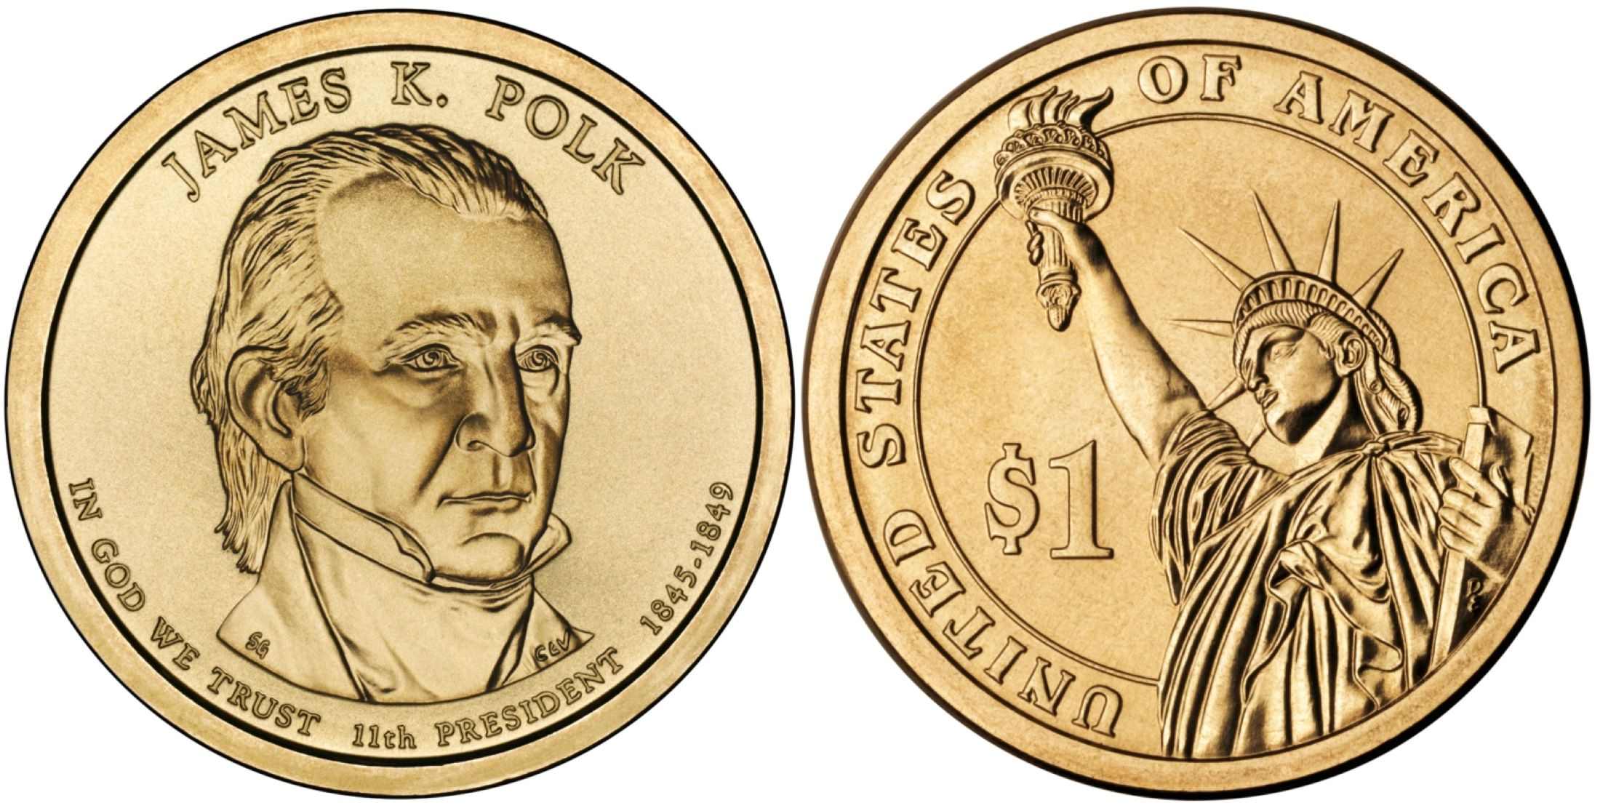 PCGS SP68 MS68 2009-P James K Polk Presidential Dollar Pos B Satin Finish